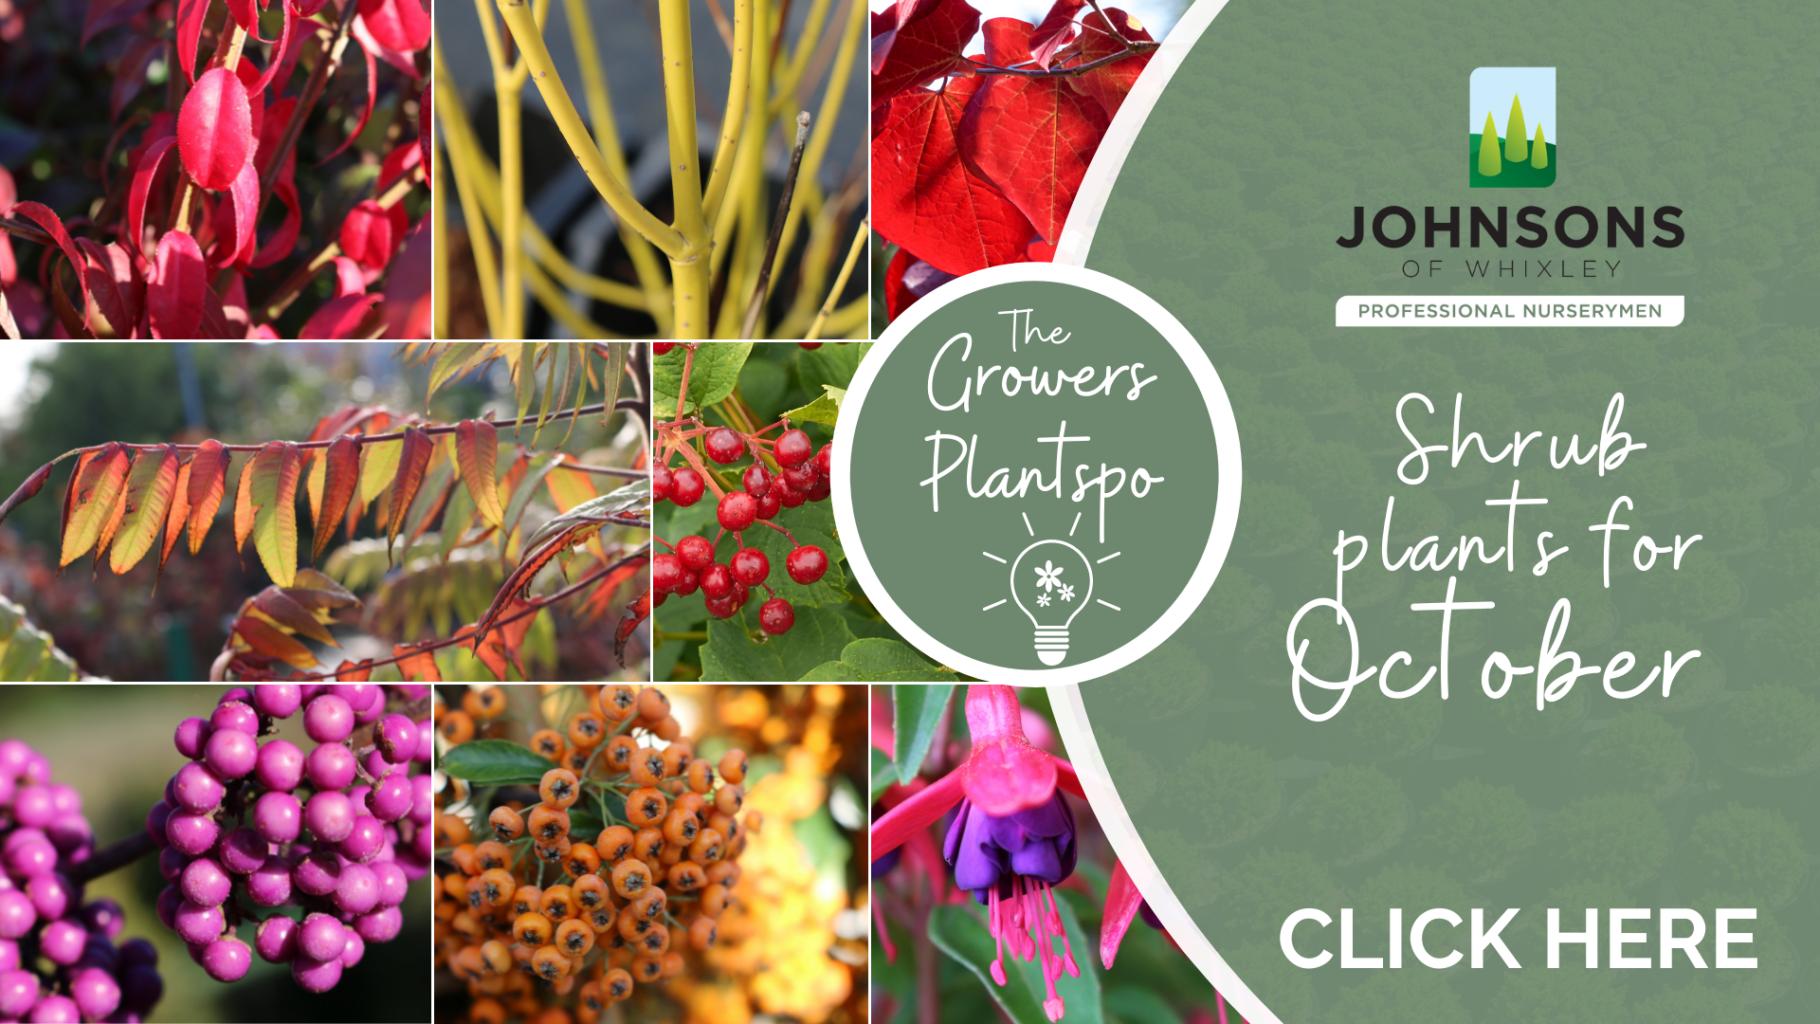 The Growers Plantspo - October Shrubs